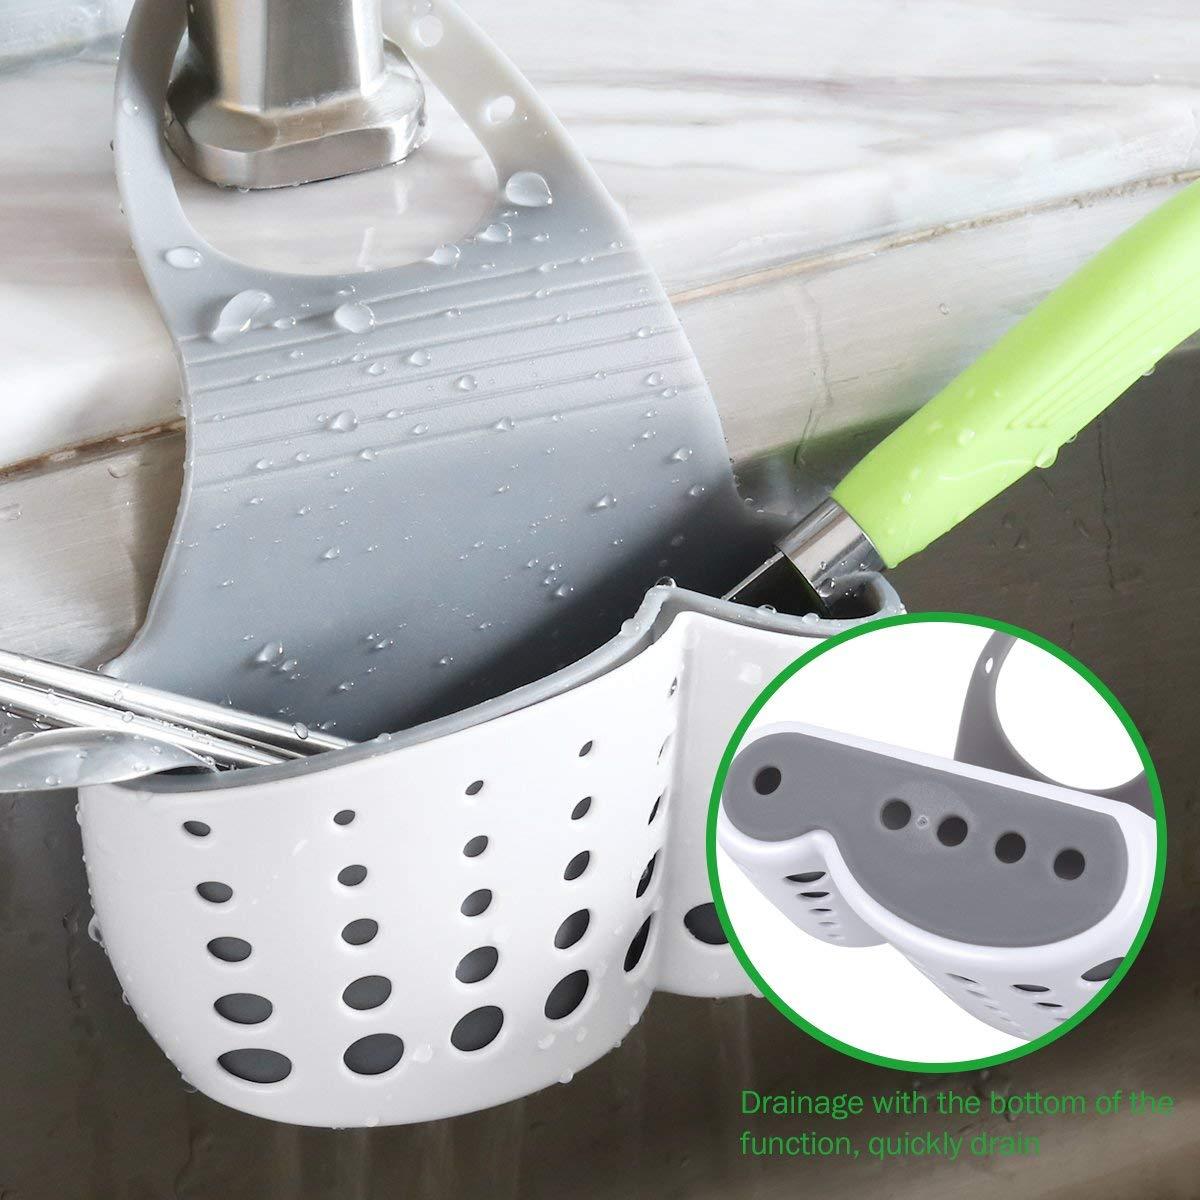 Soporte para Jab/ón Blanco GS Estante de Almacenamiento para Fregadero Organizador de Fregadero Cocina Cesto Porta Esponja Jabonera Blanco